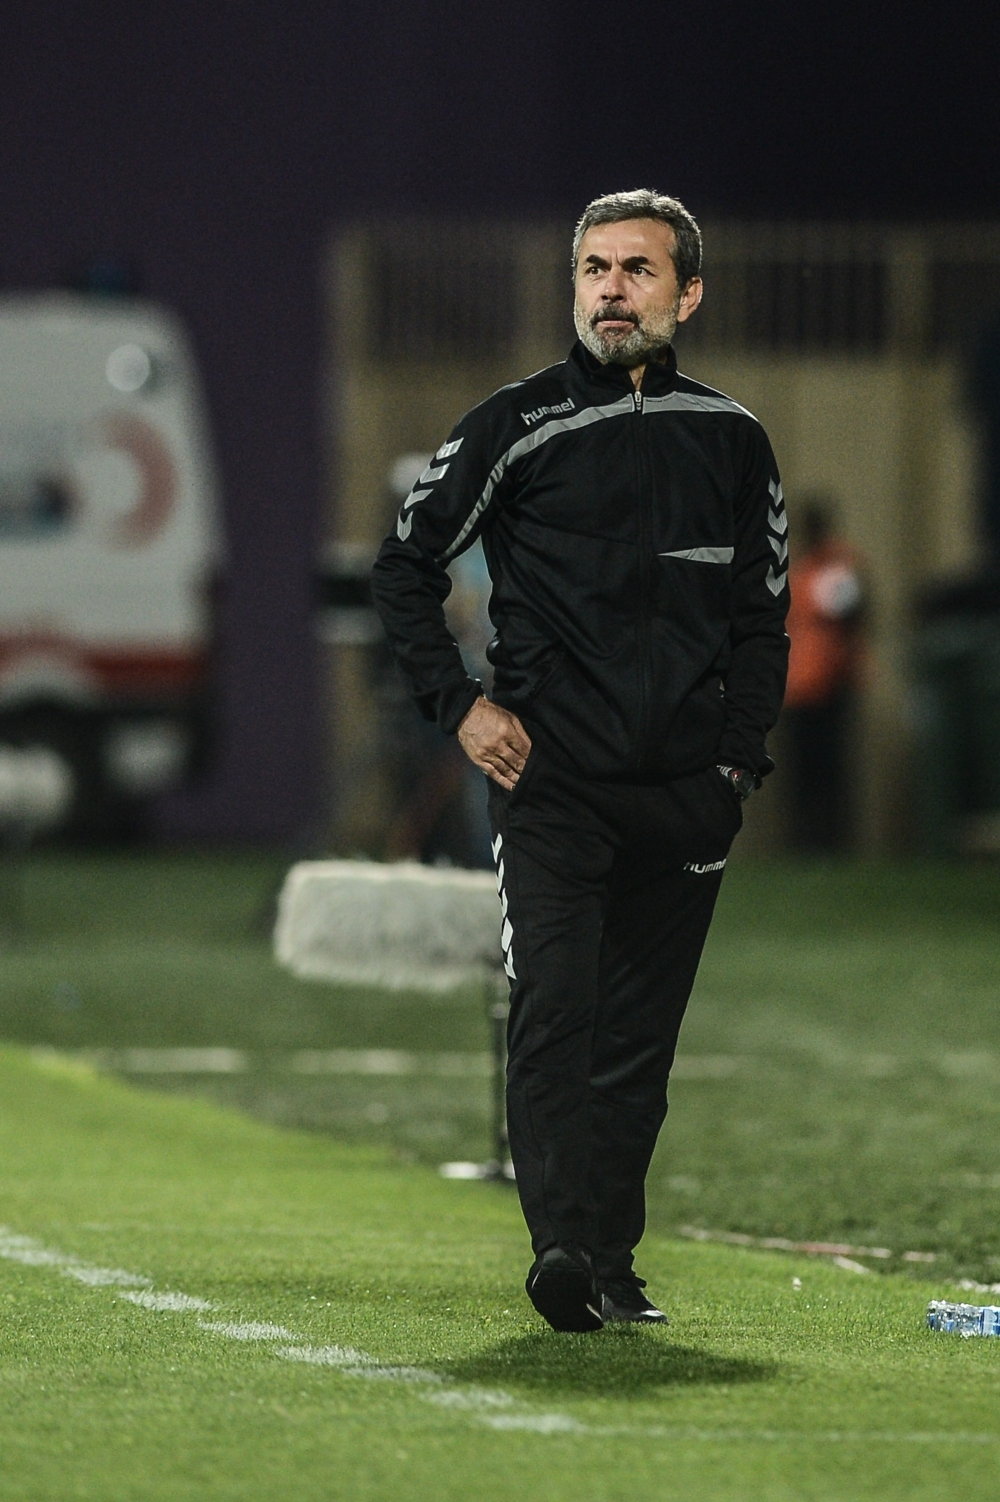 Osmanlıspor-Torku Konyaspor: 1-2 15